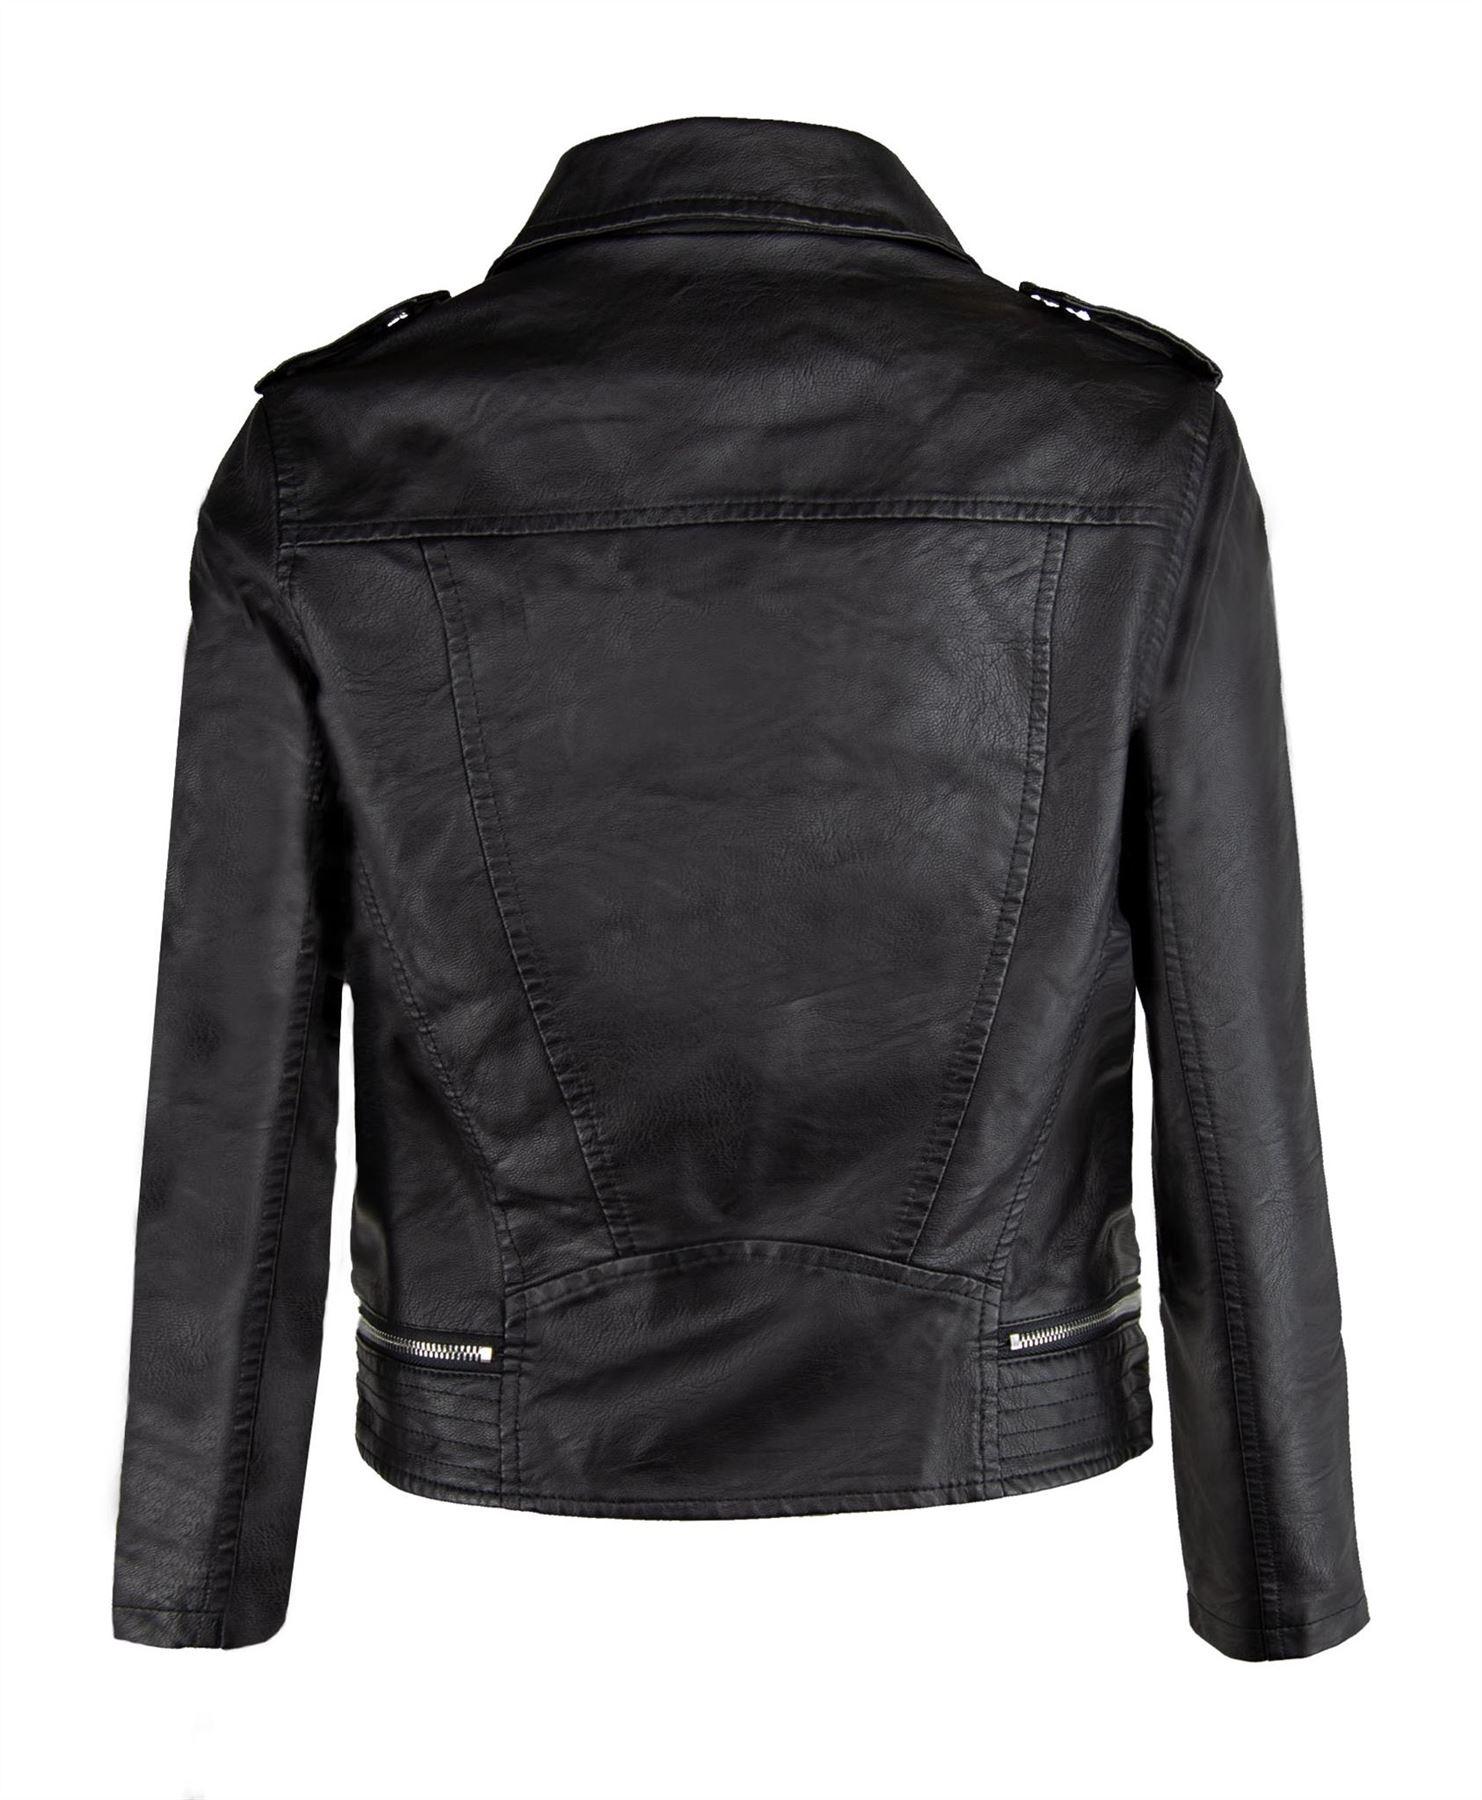 Da-Donna-Zip-Soffice-In-Finta-Pelle-Stile-Biker-Giacca-Cappotto-Donna-Con-Spalline-Crop-Taglie-S-XL